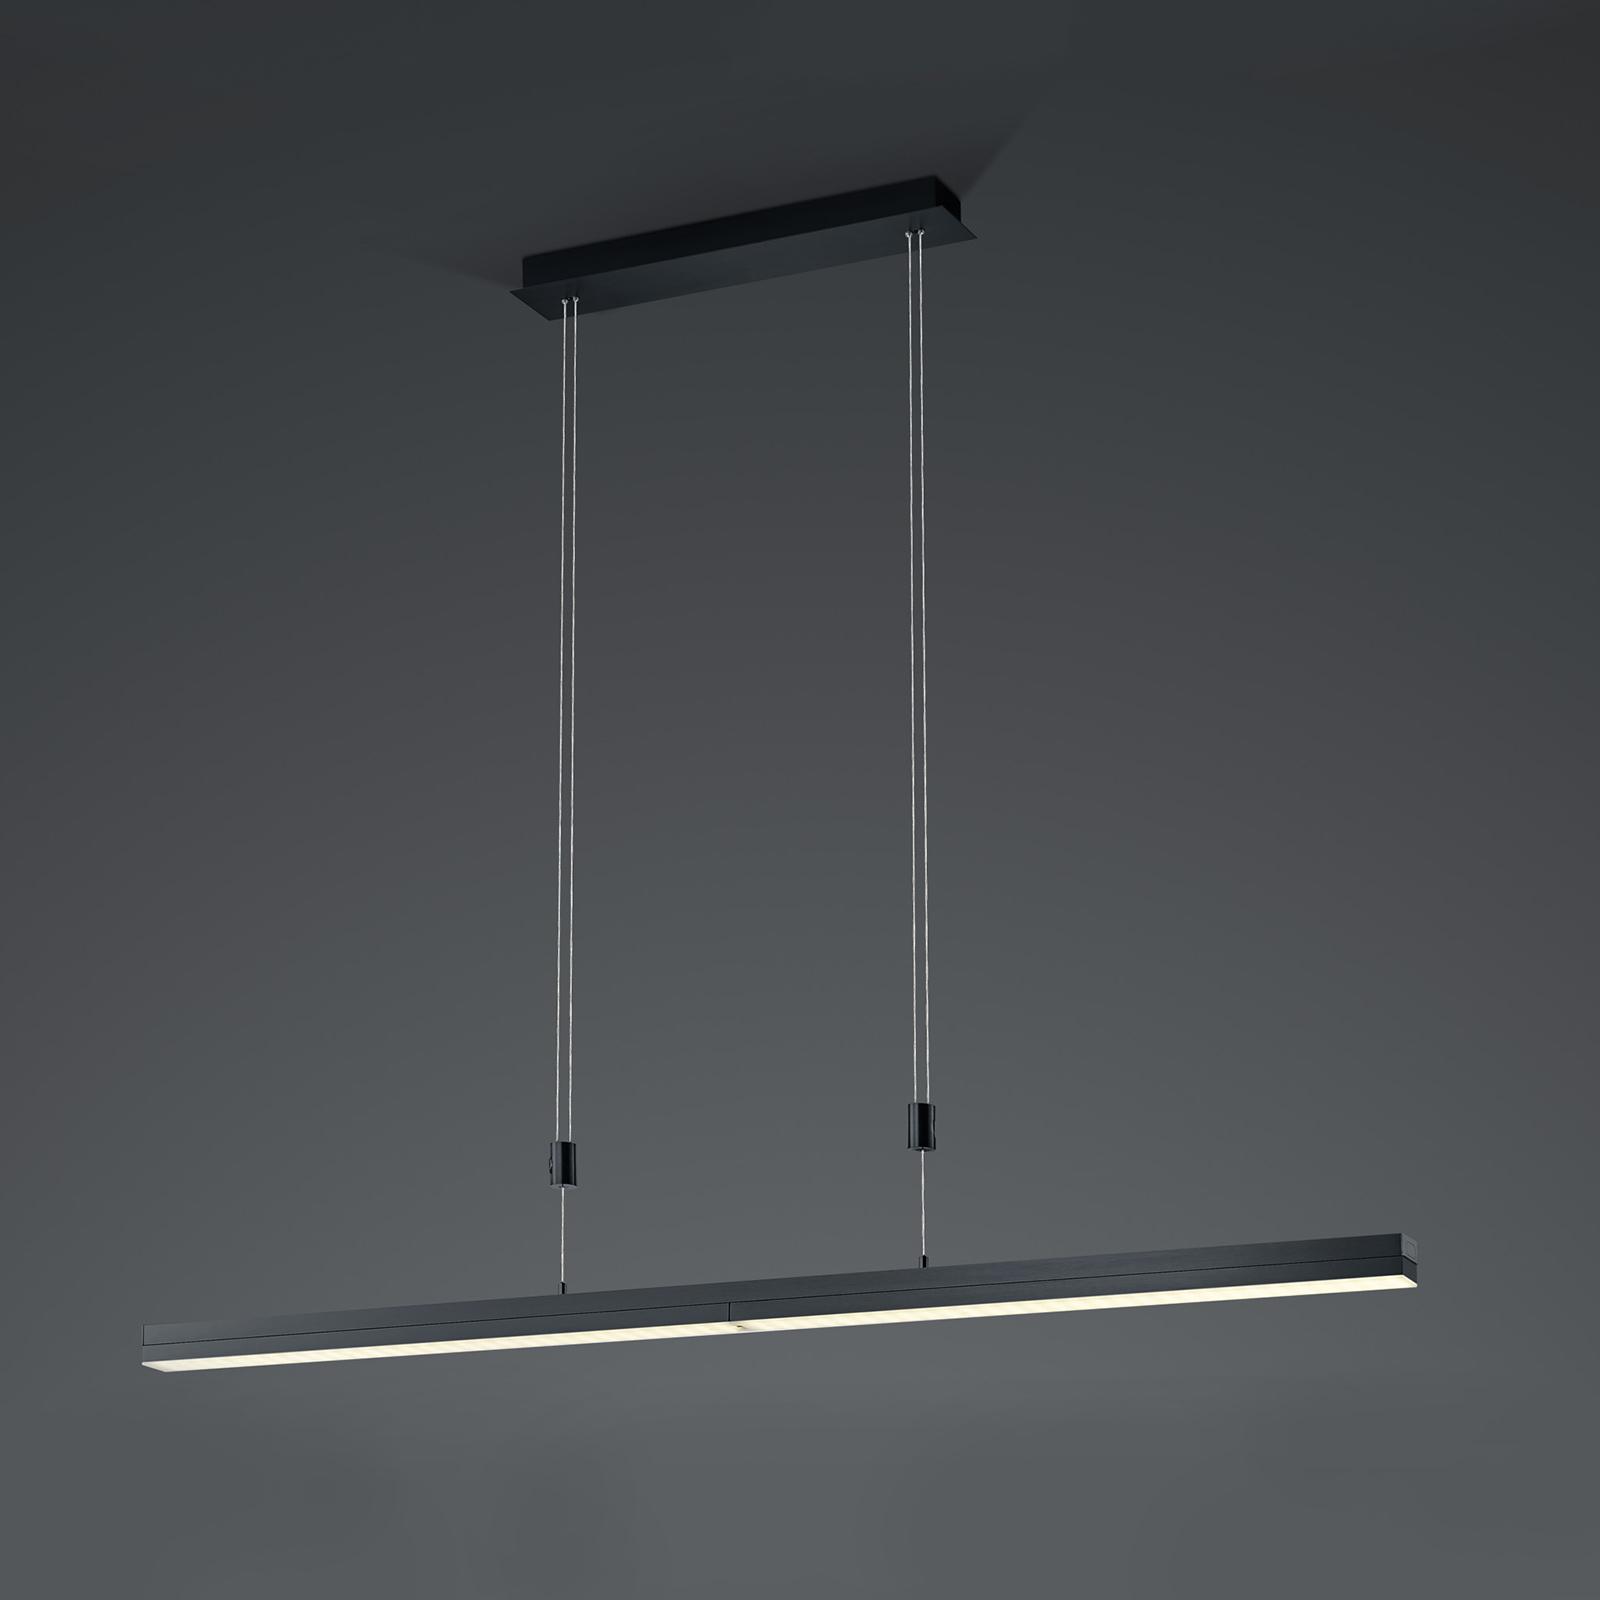 B-Leuchten Expanda-X LED hanglamp, antraciet